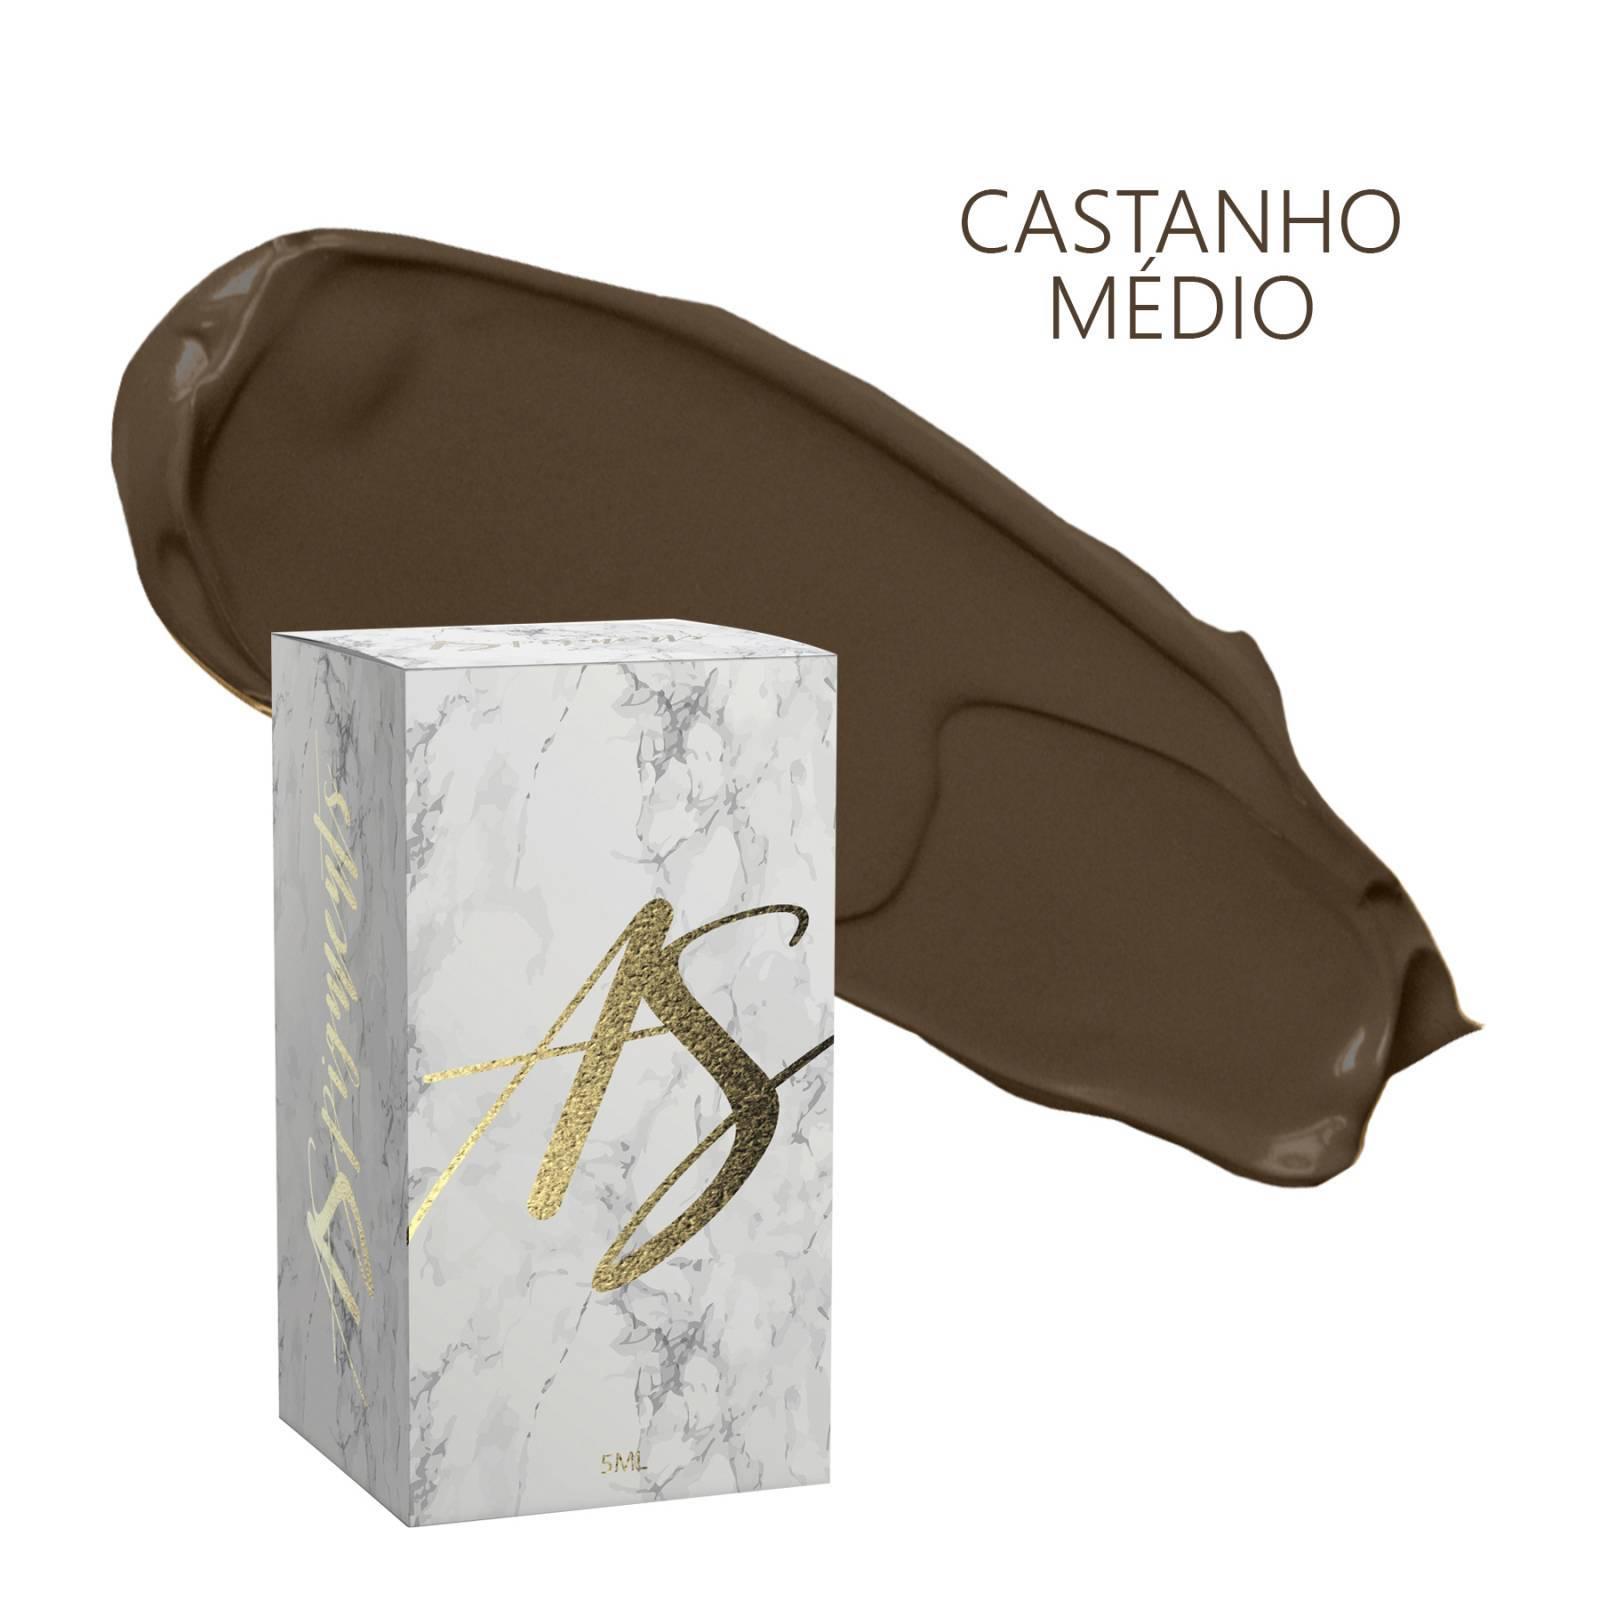 Pigmento Castanho médio frio- embalagem 5 ml - Loja Ana Paulla